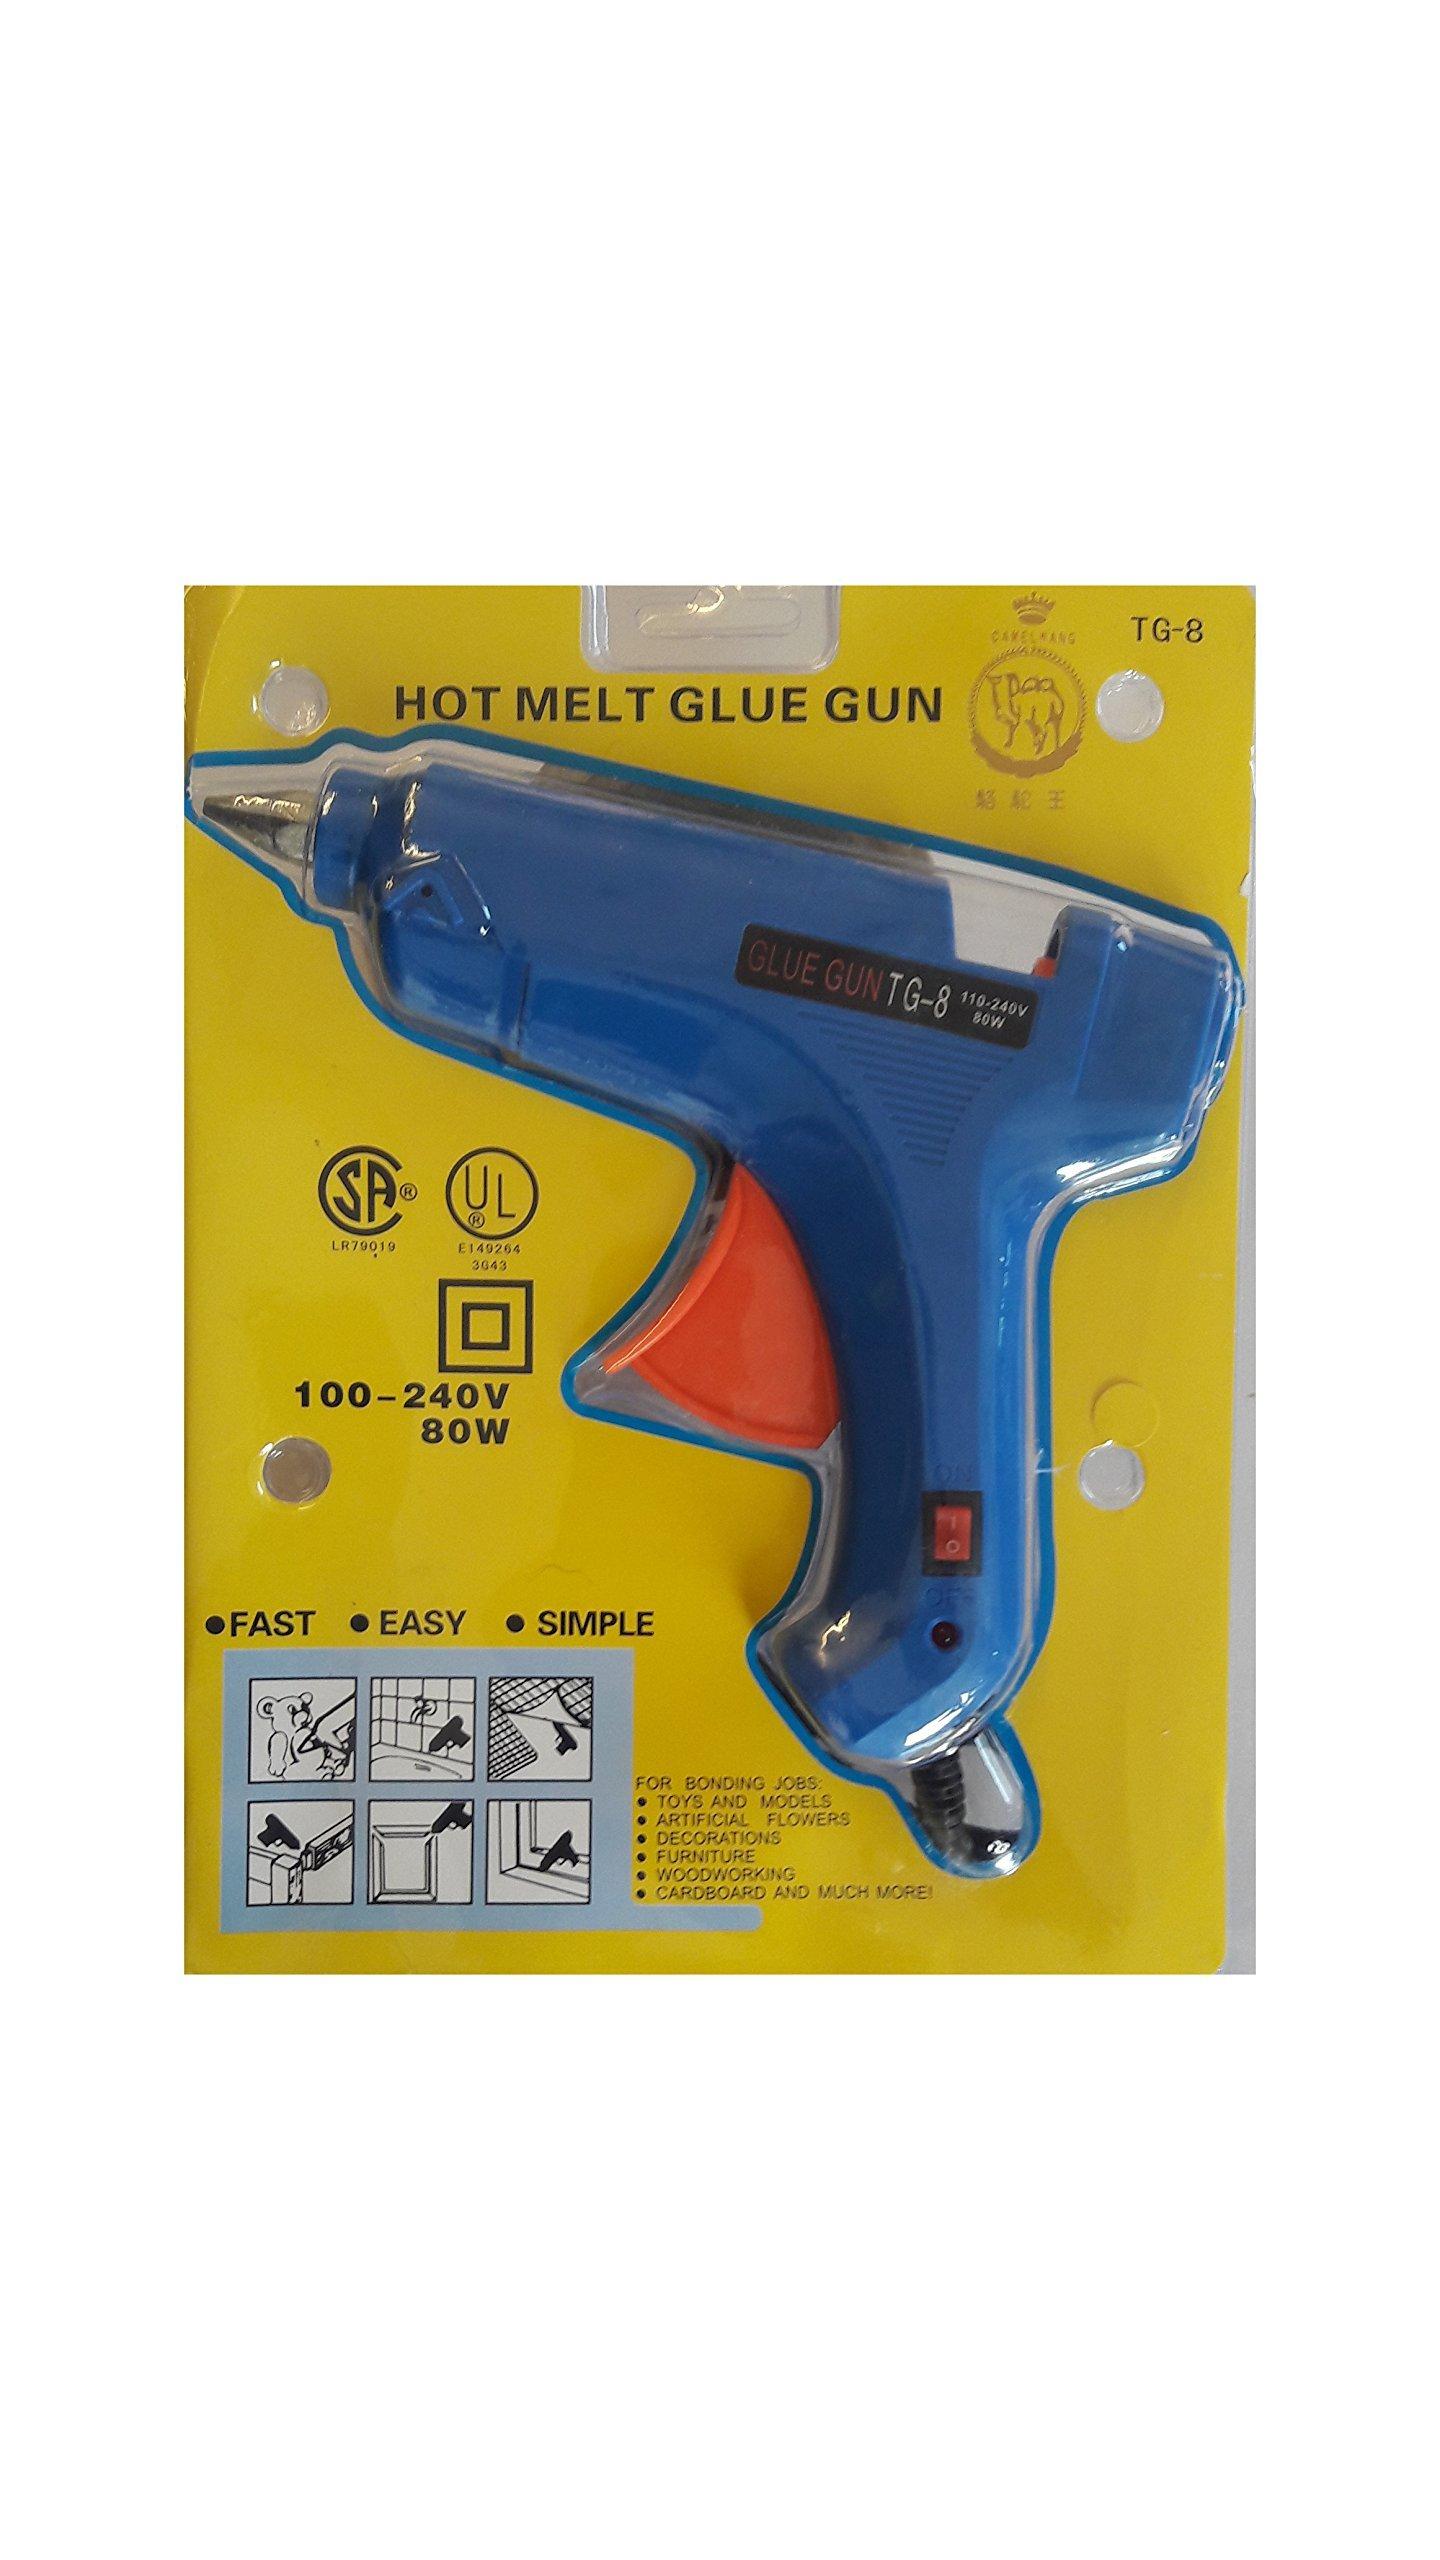 Heirloom Quality Tg-8 80 Watt Hot Glue Gun With Glue Sticks (10 Sticks)